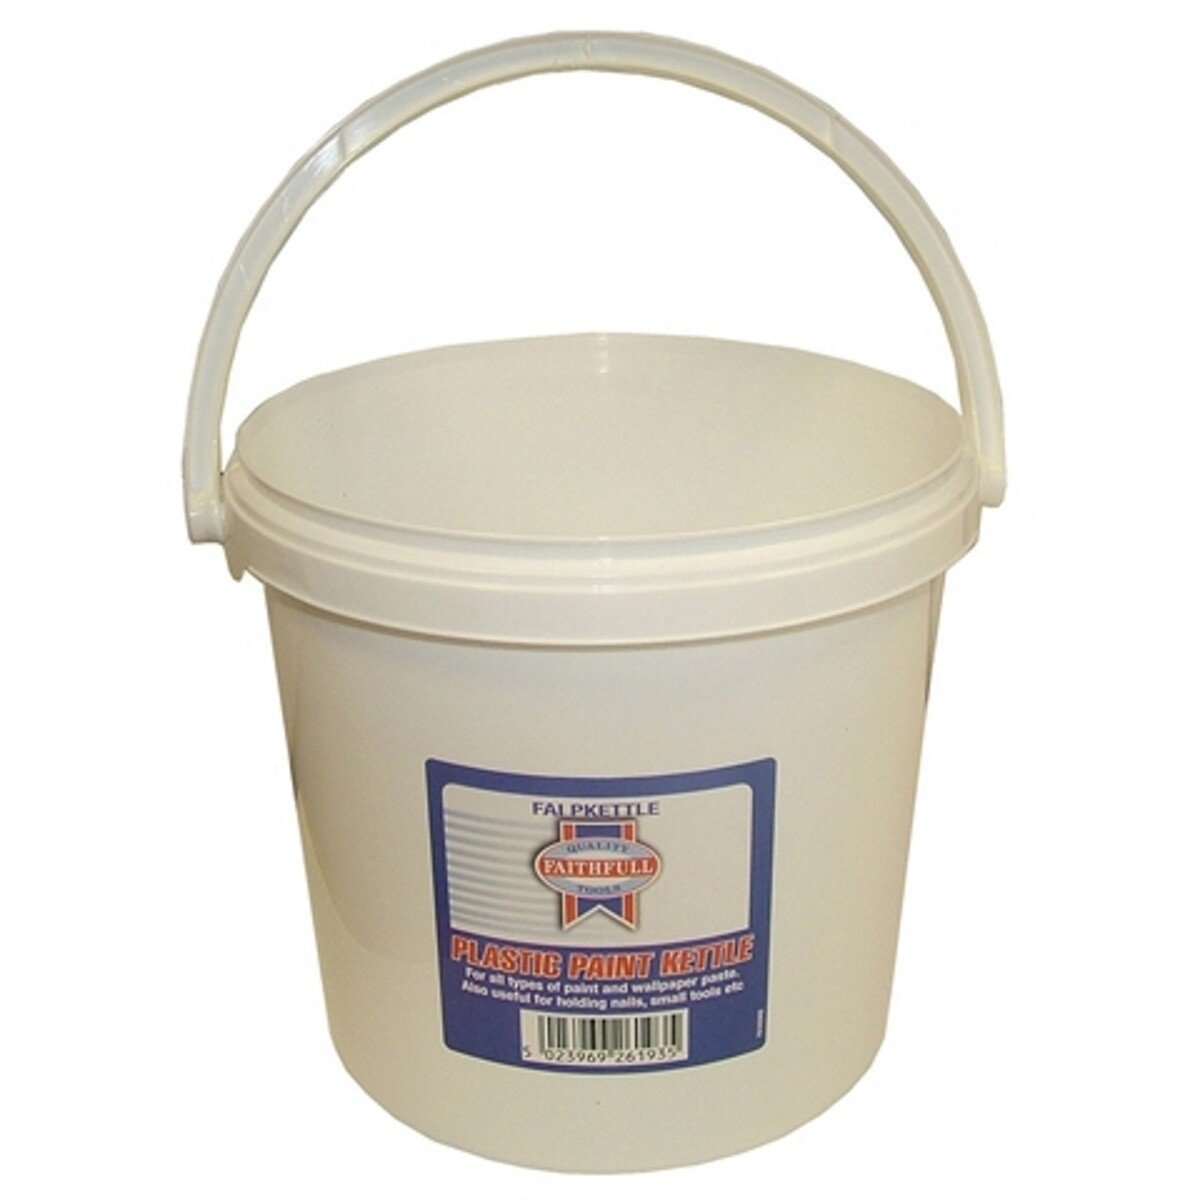 Faithfull FAIPKETTLE Paint Kettle Plastic 2.5 Litres